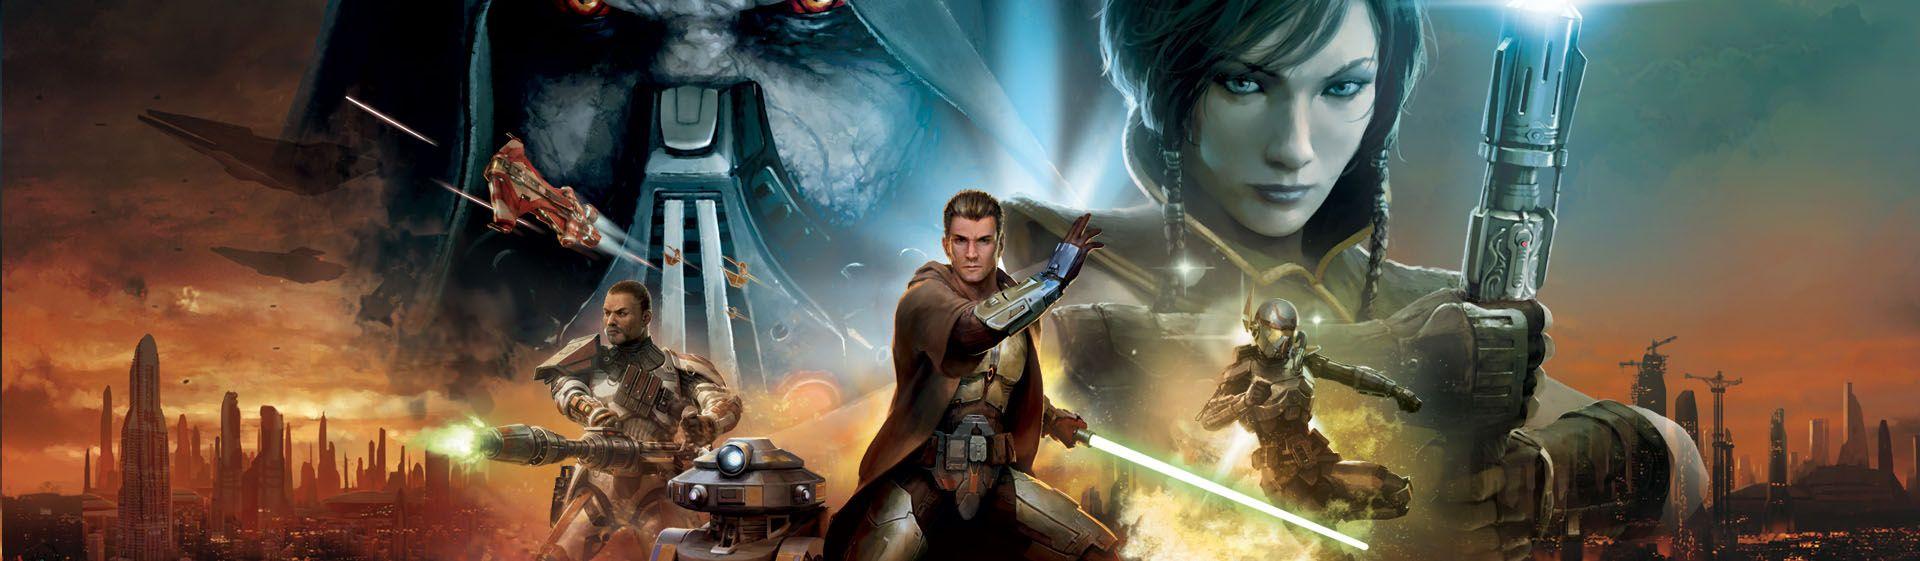 Star Wars: Knights of the Old Republic pode ganhar novo jogo, segundo rumor